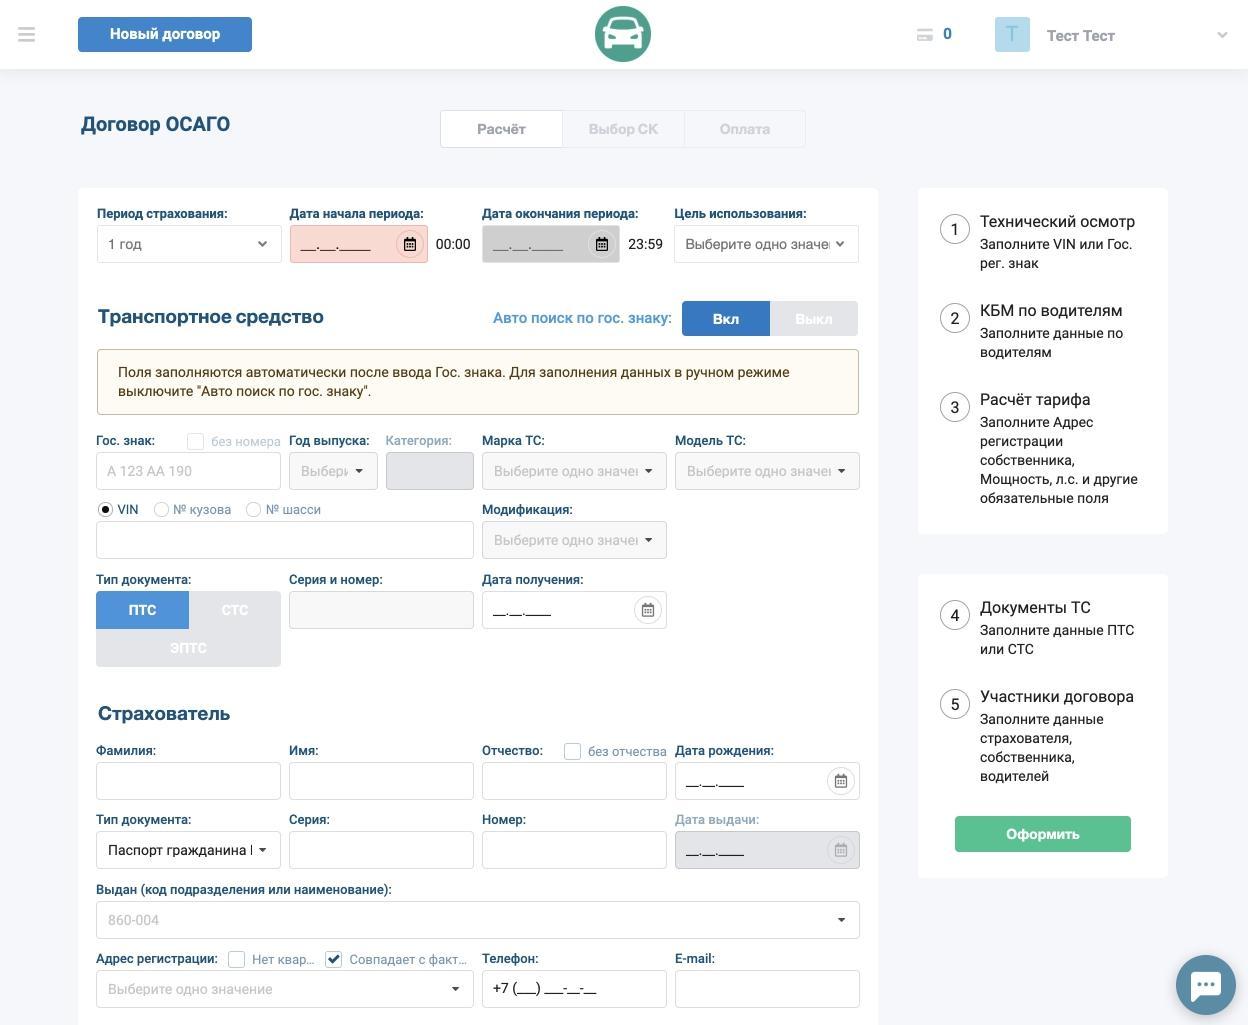 Платформа agents.osagoonline.ru